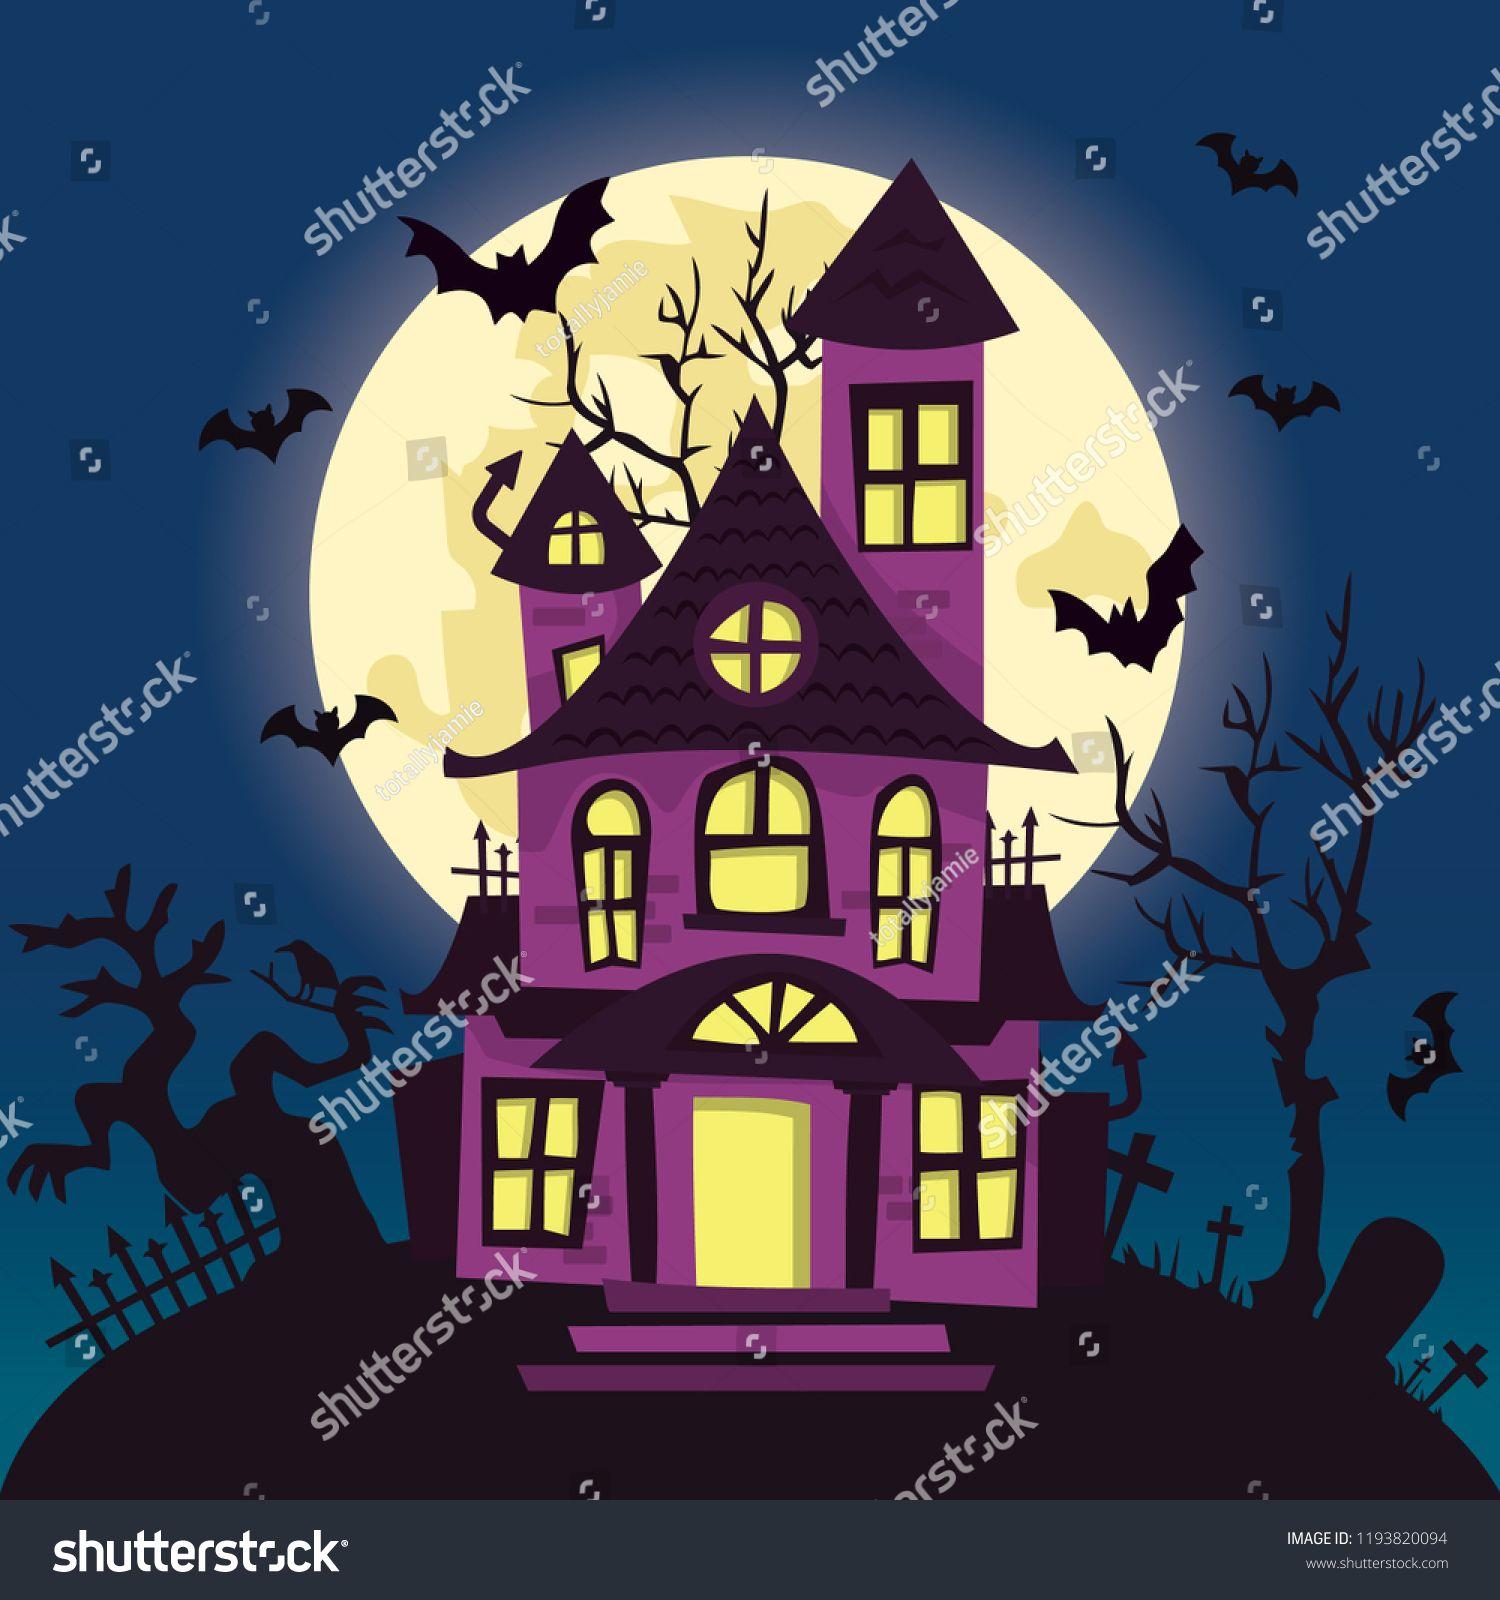 A vector illustration of a cartoon creepy haunted house on